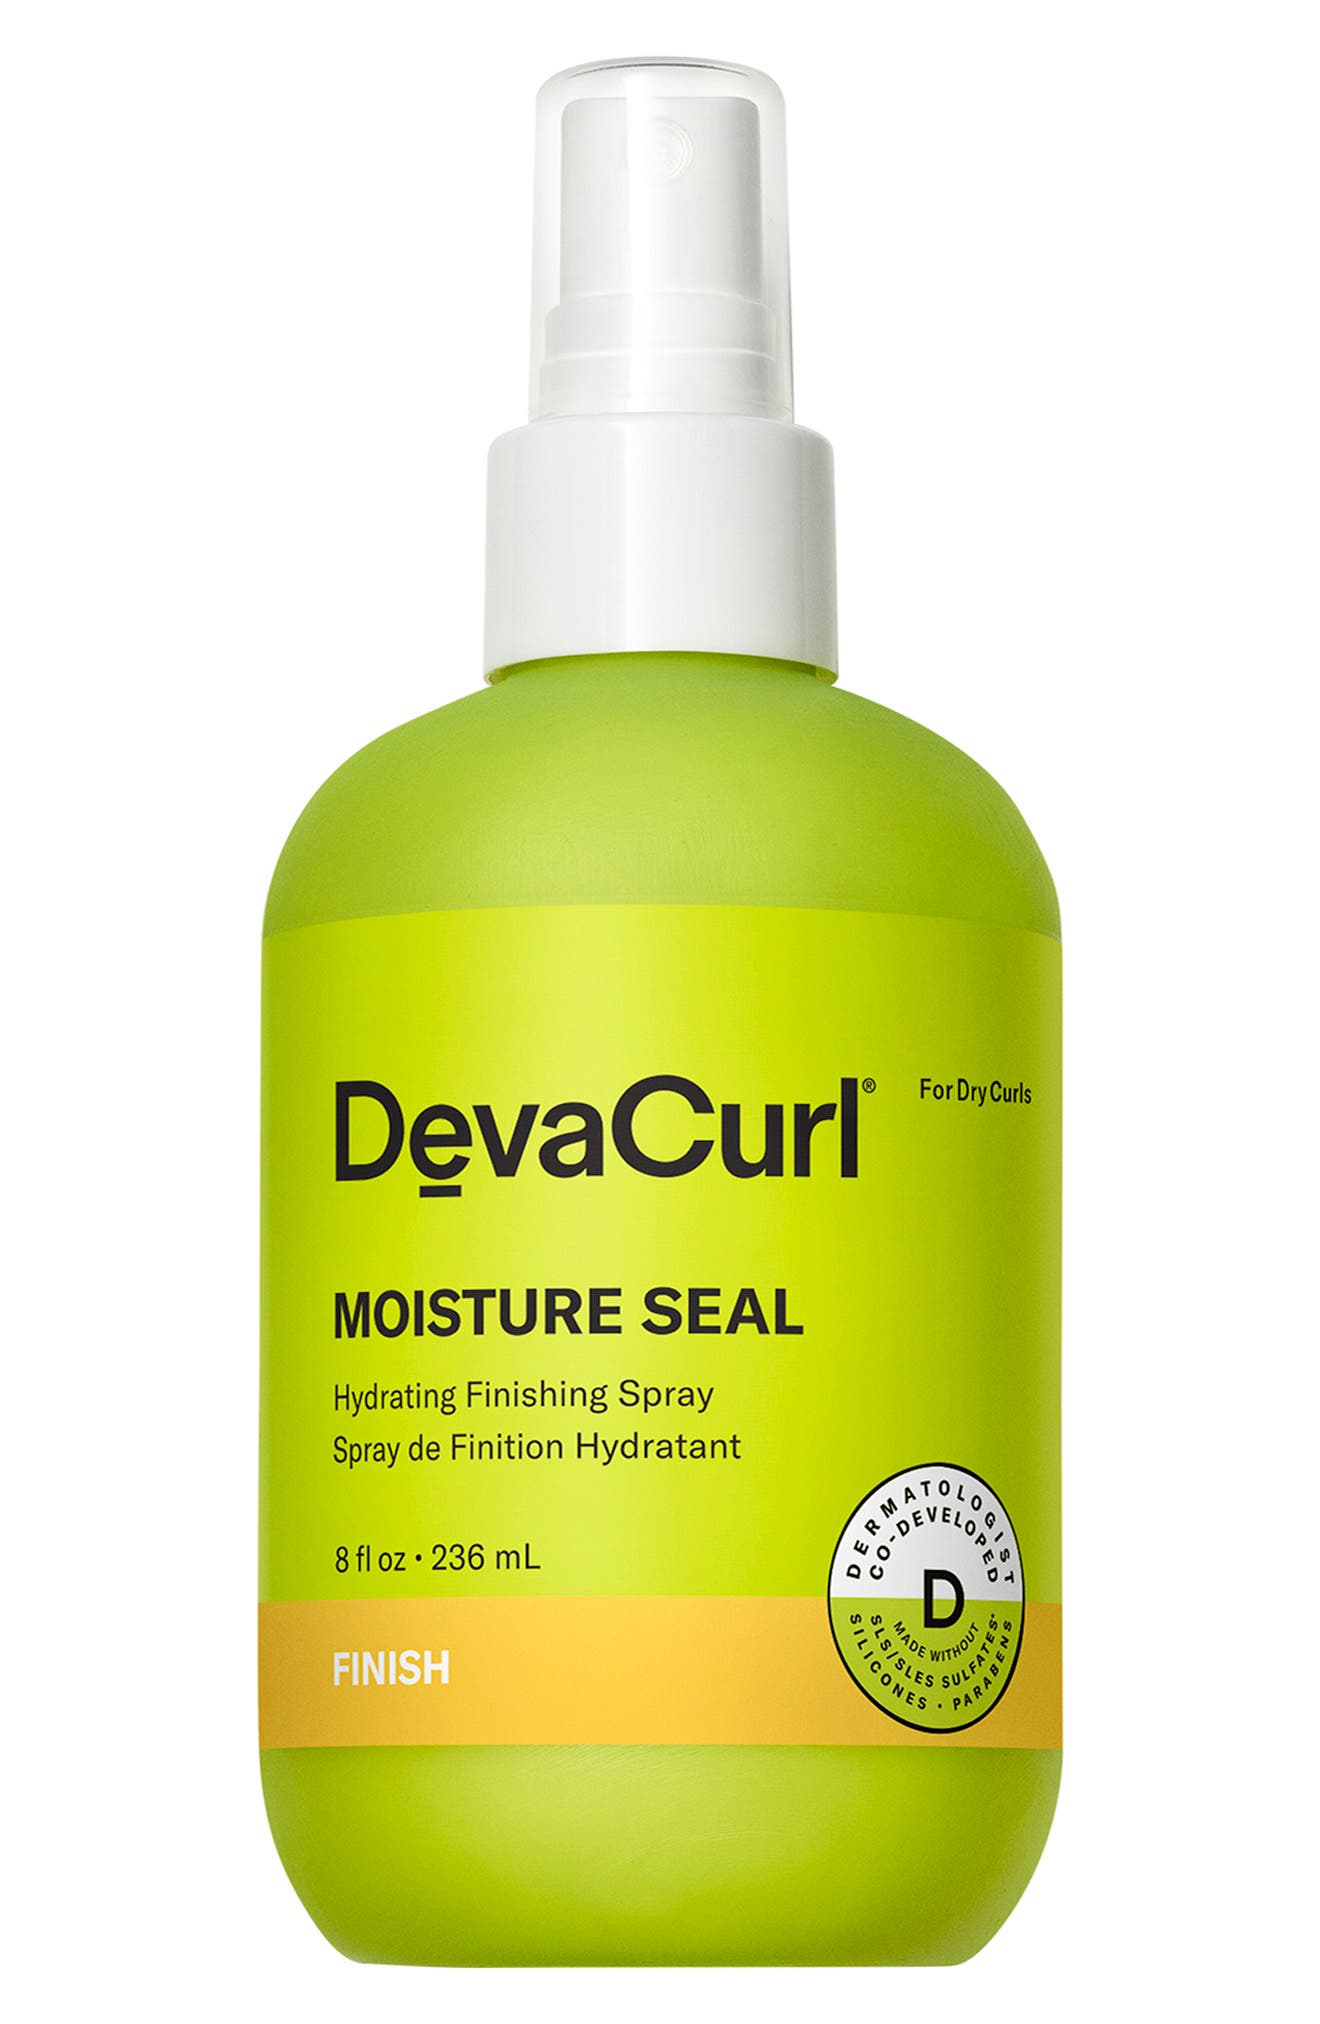 Moisture Seal Hydrating Finishing Spray